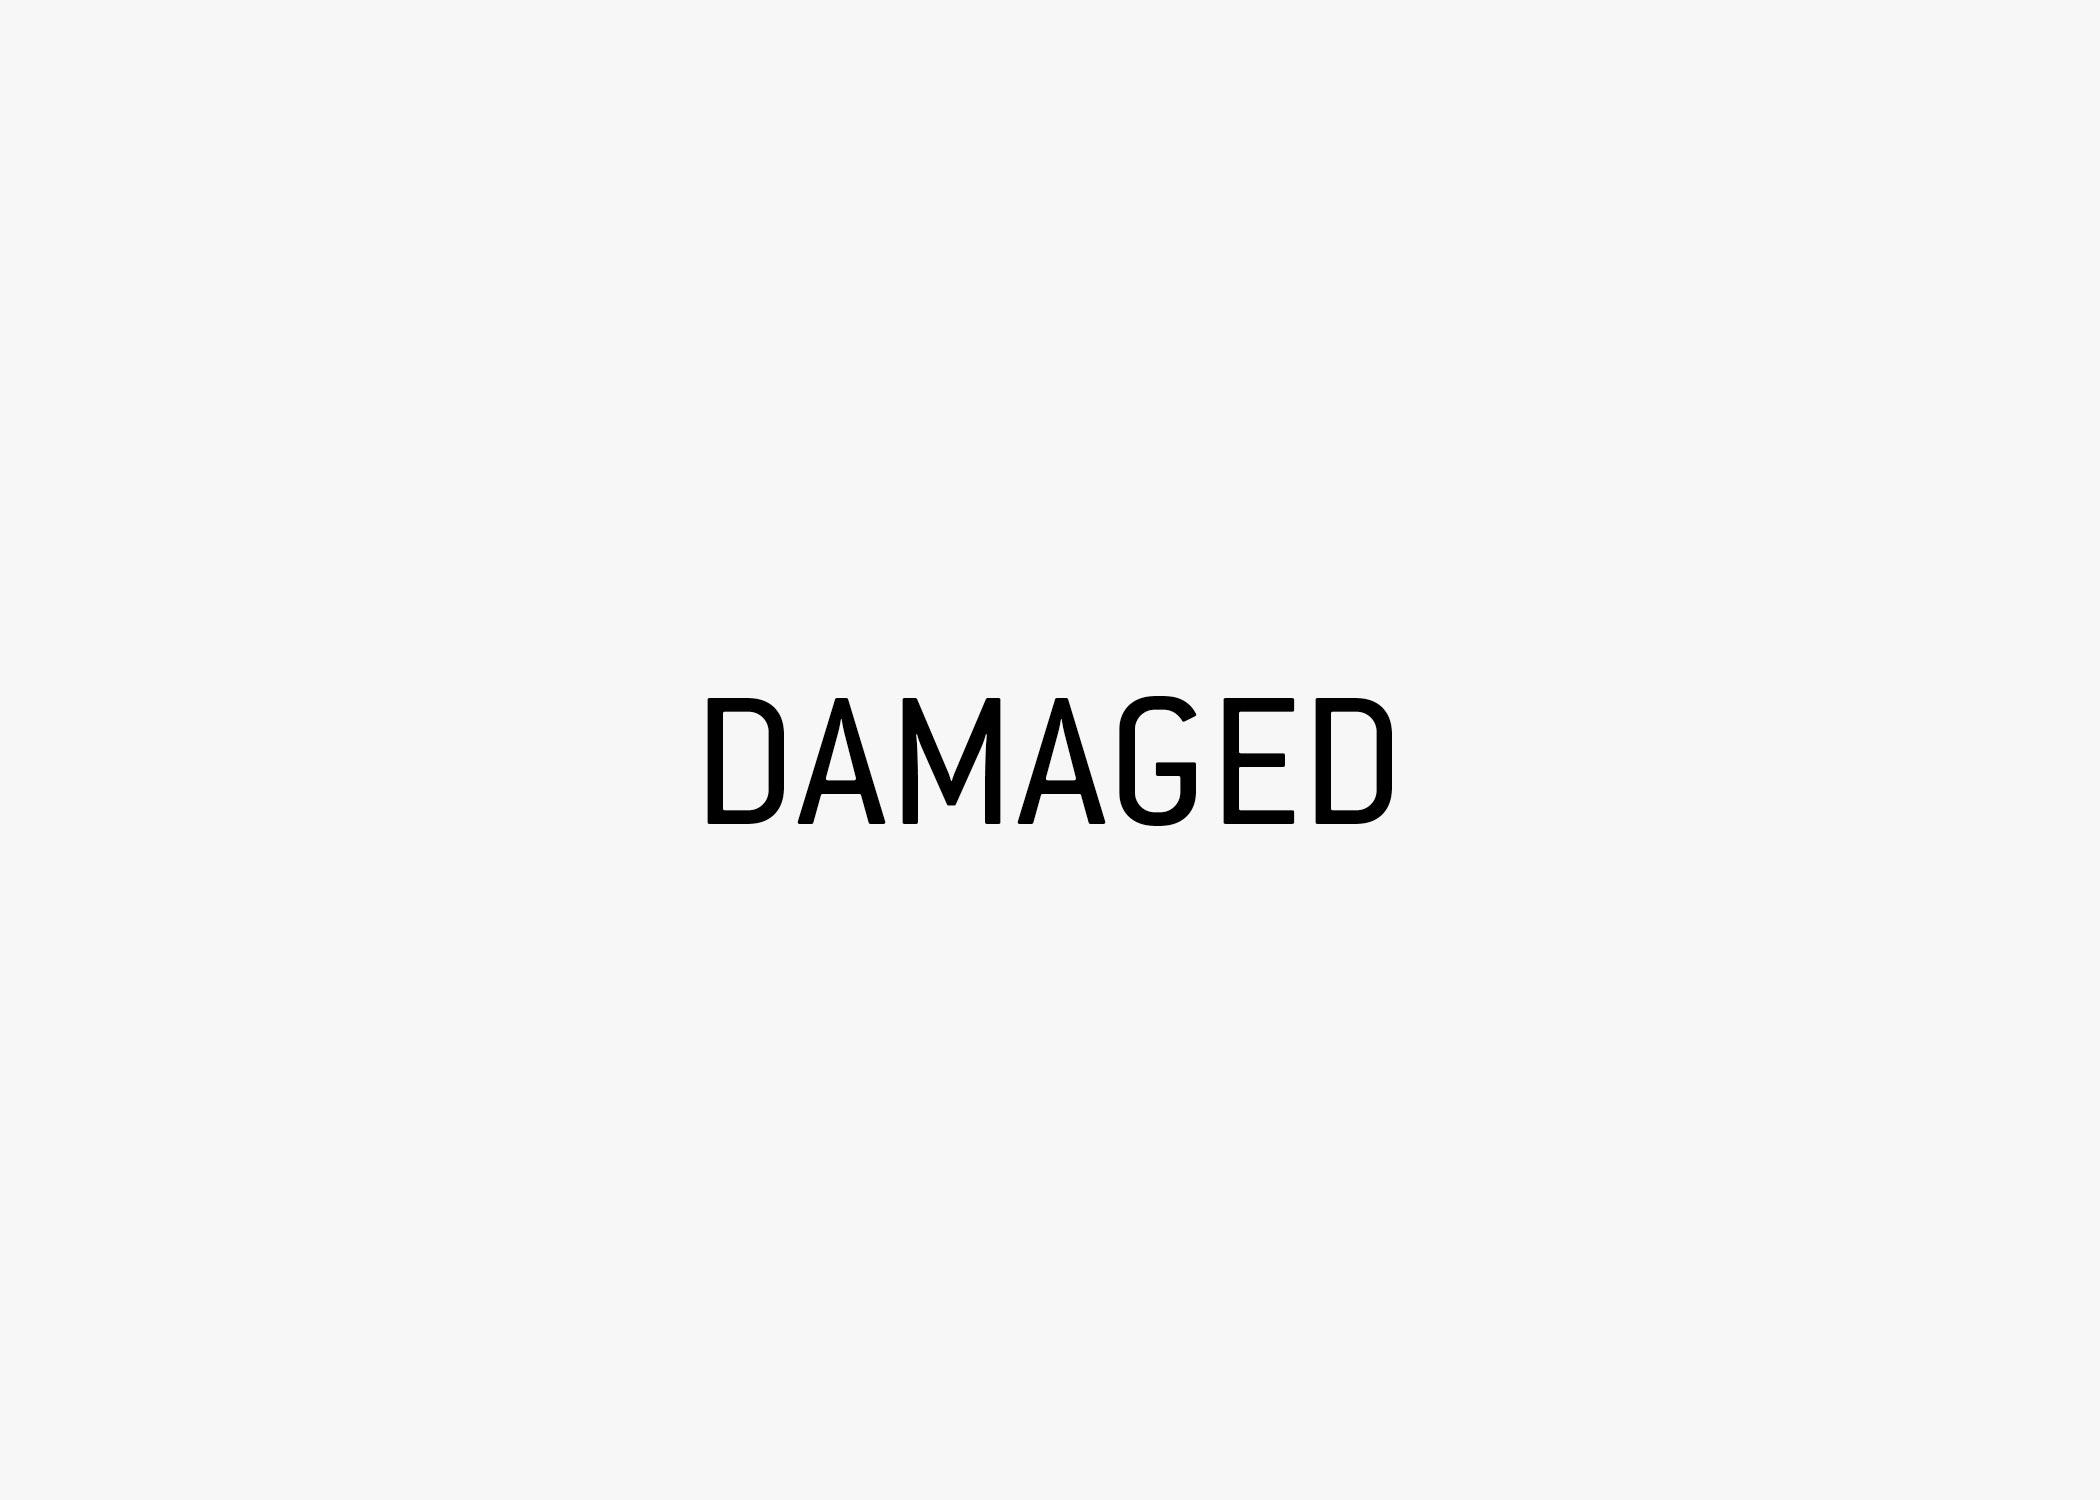 damaged.jpg